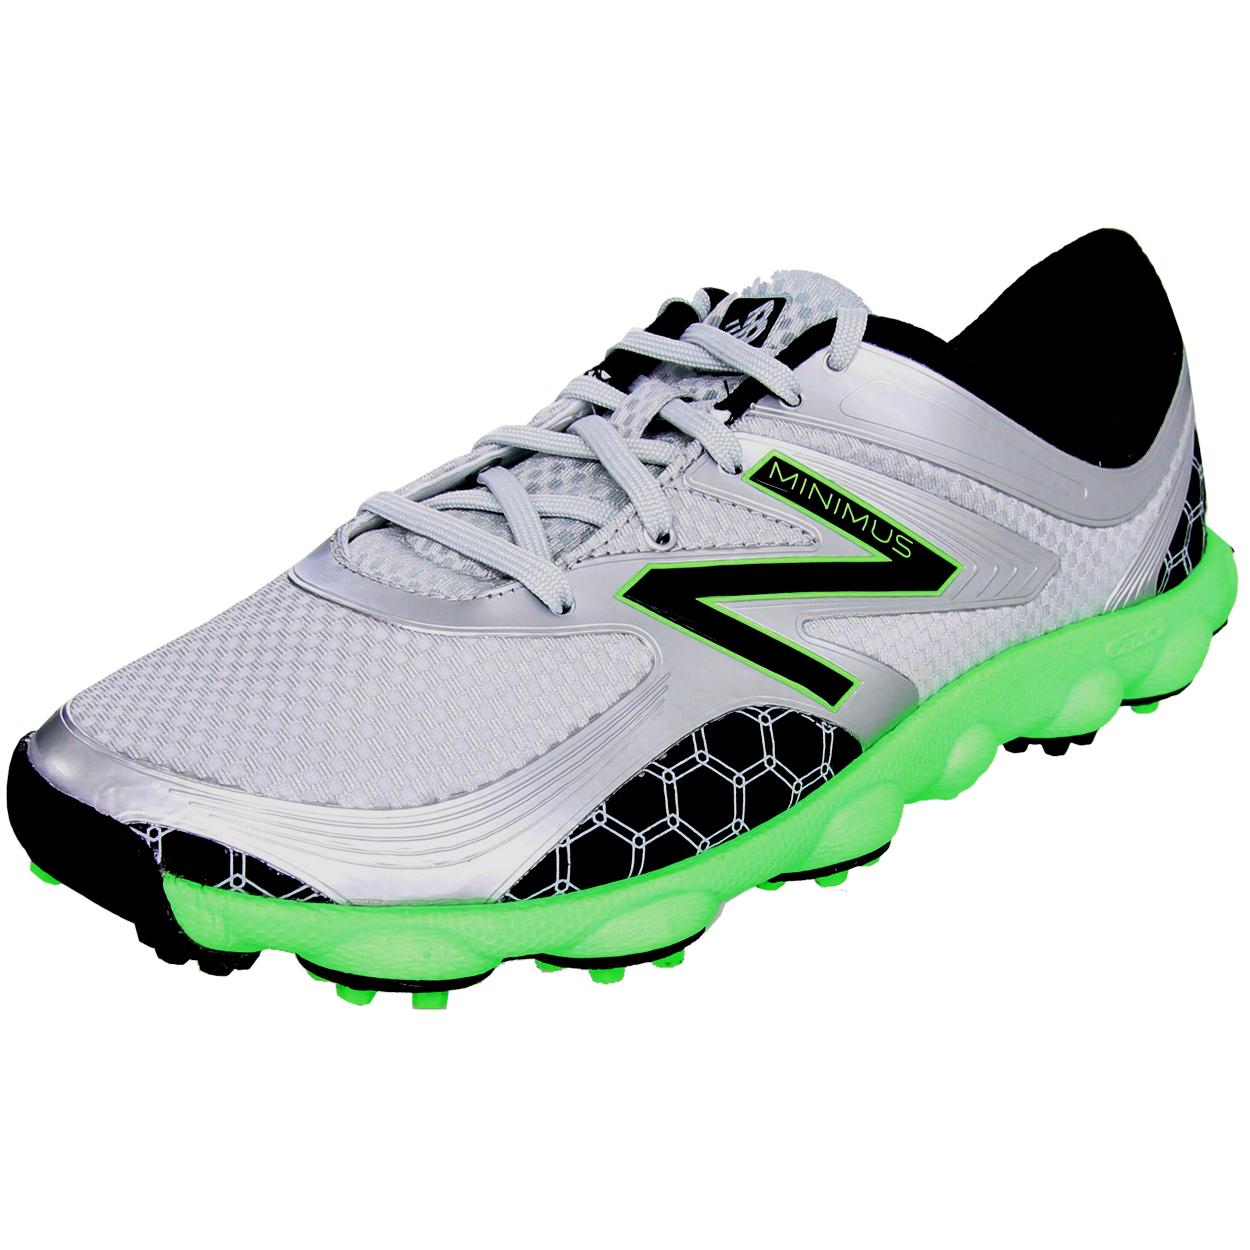 New Balance Men S Minimus Sport Mesh Golf Shoe